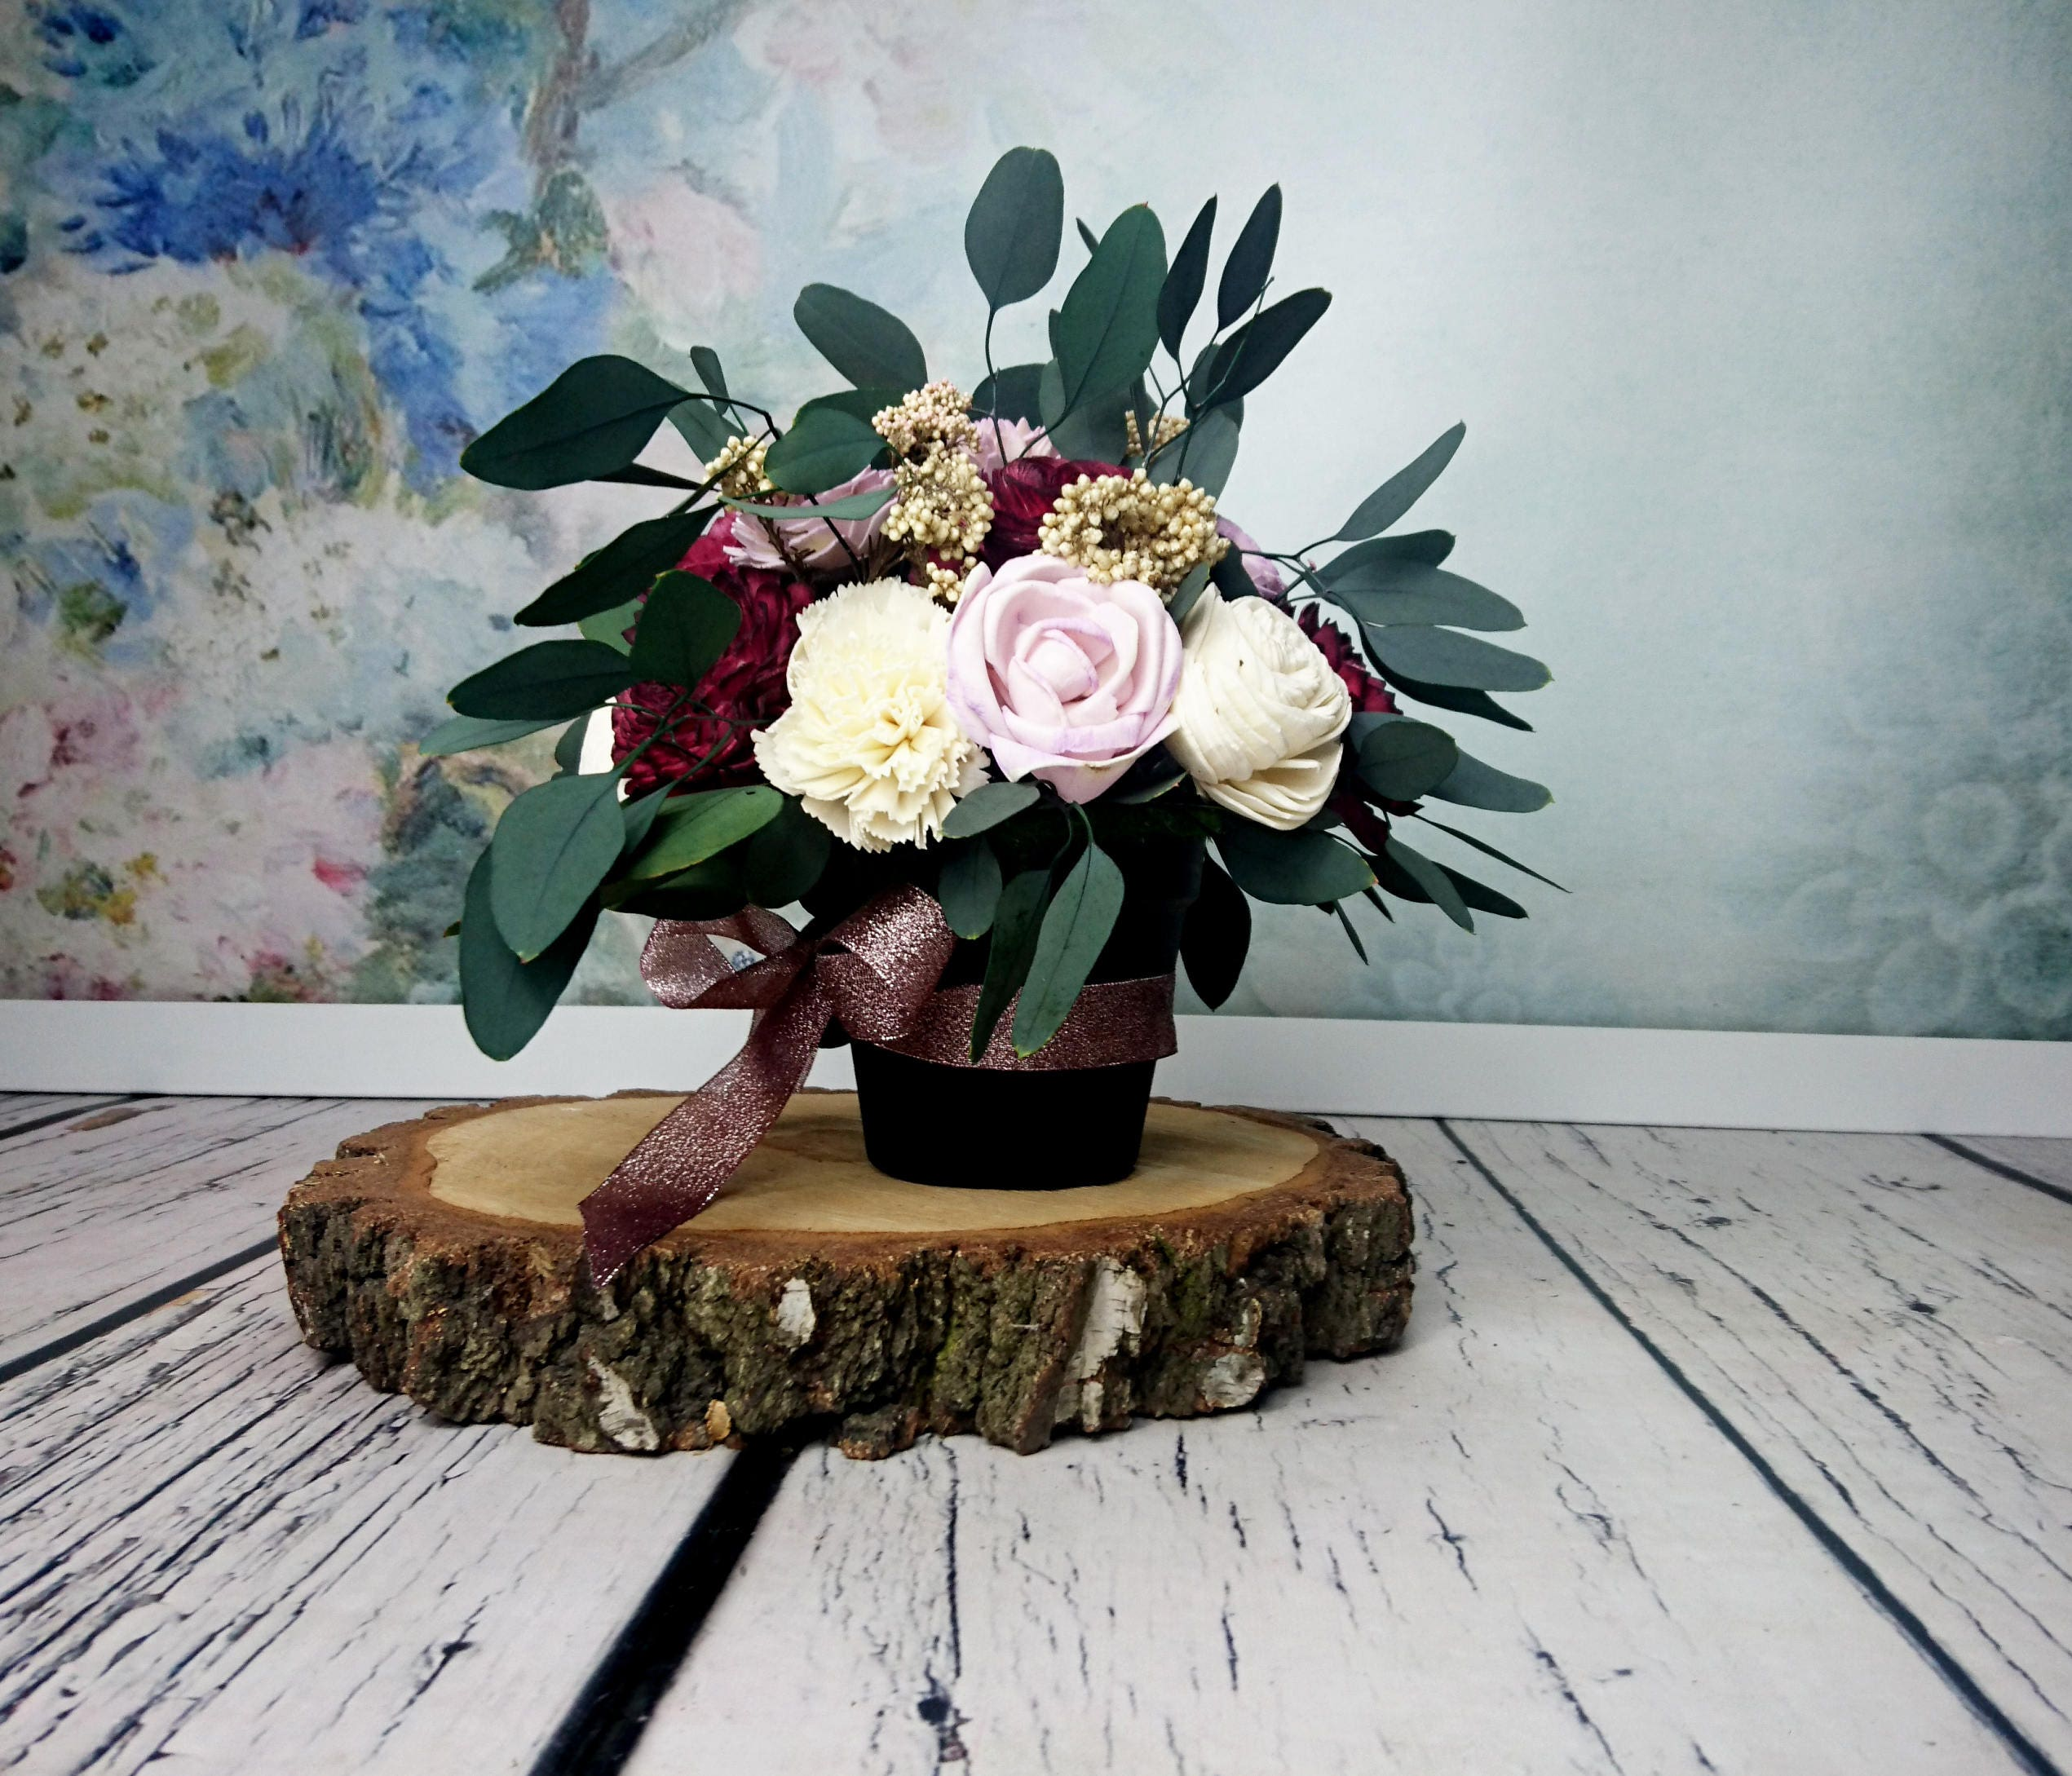 Wedding Altar Flowers With Eucalyptus: Wedding Floral Arrangement Table Centerpiece Sola Flowers